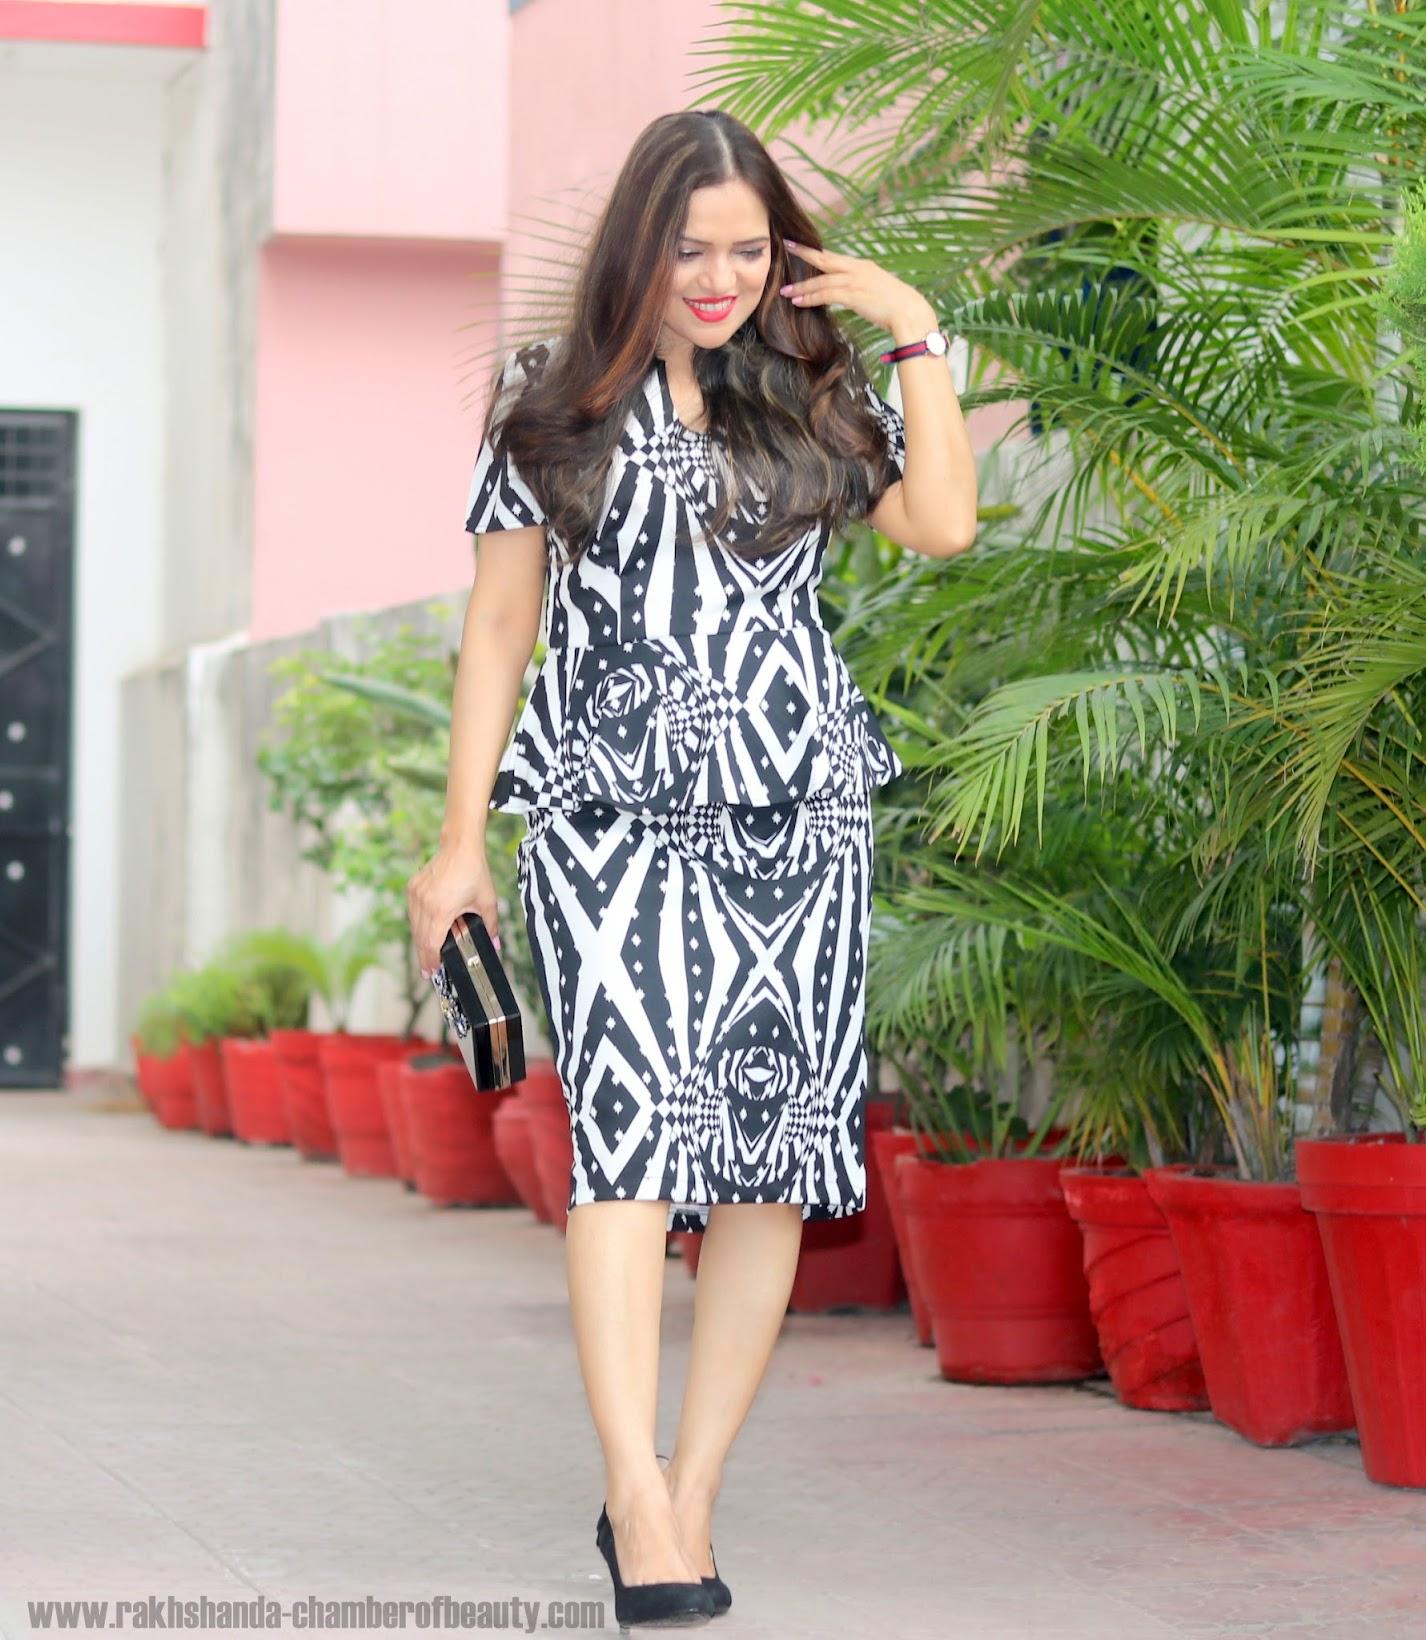 The monochrome fashion trend, Everyhting5pounds Peplum dress, Indian fashion blogger, Chamber of Beauty